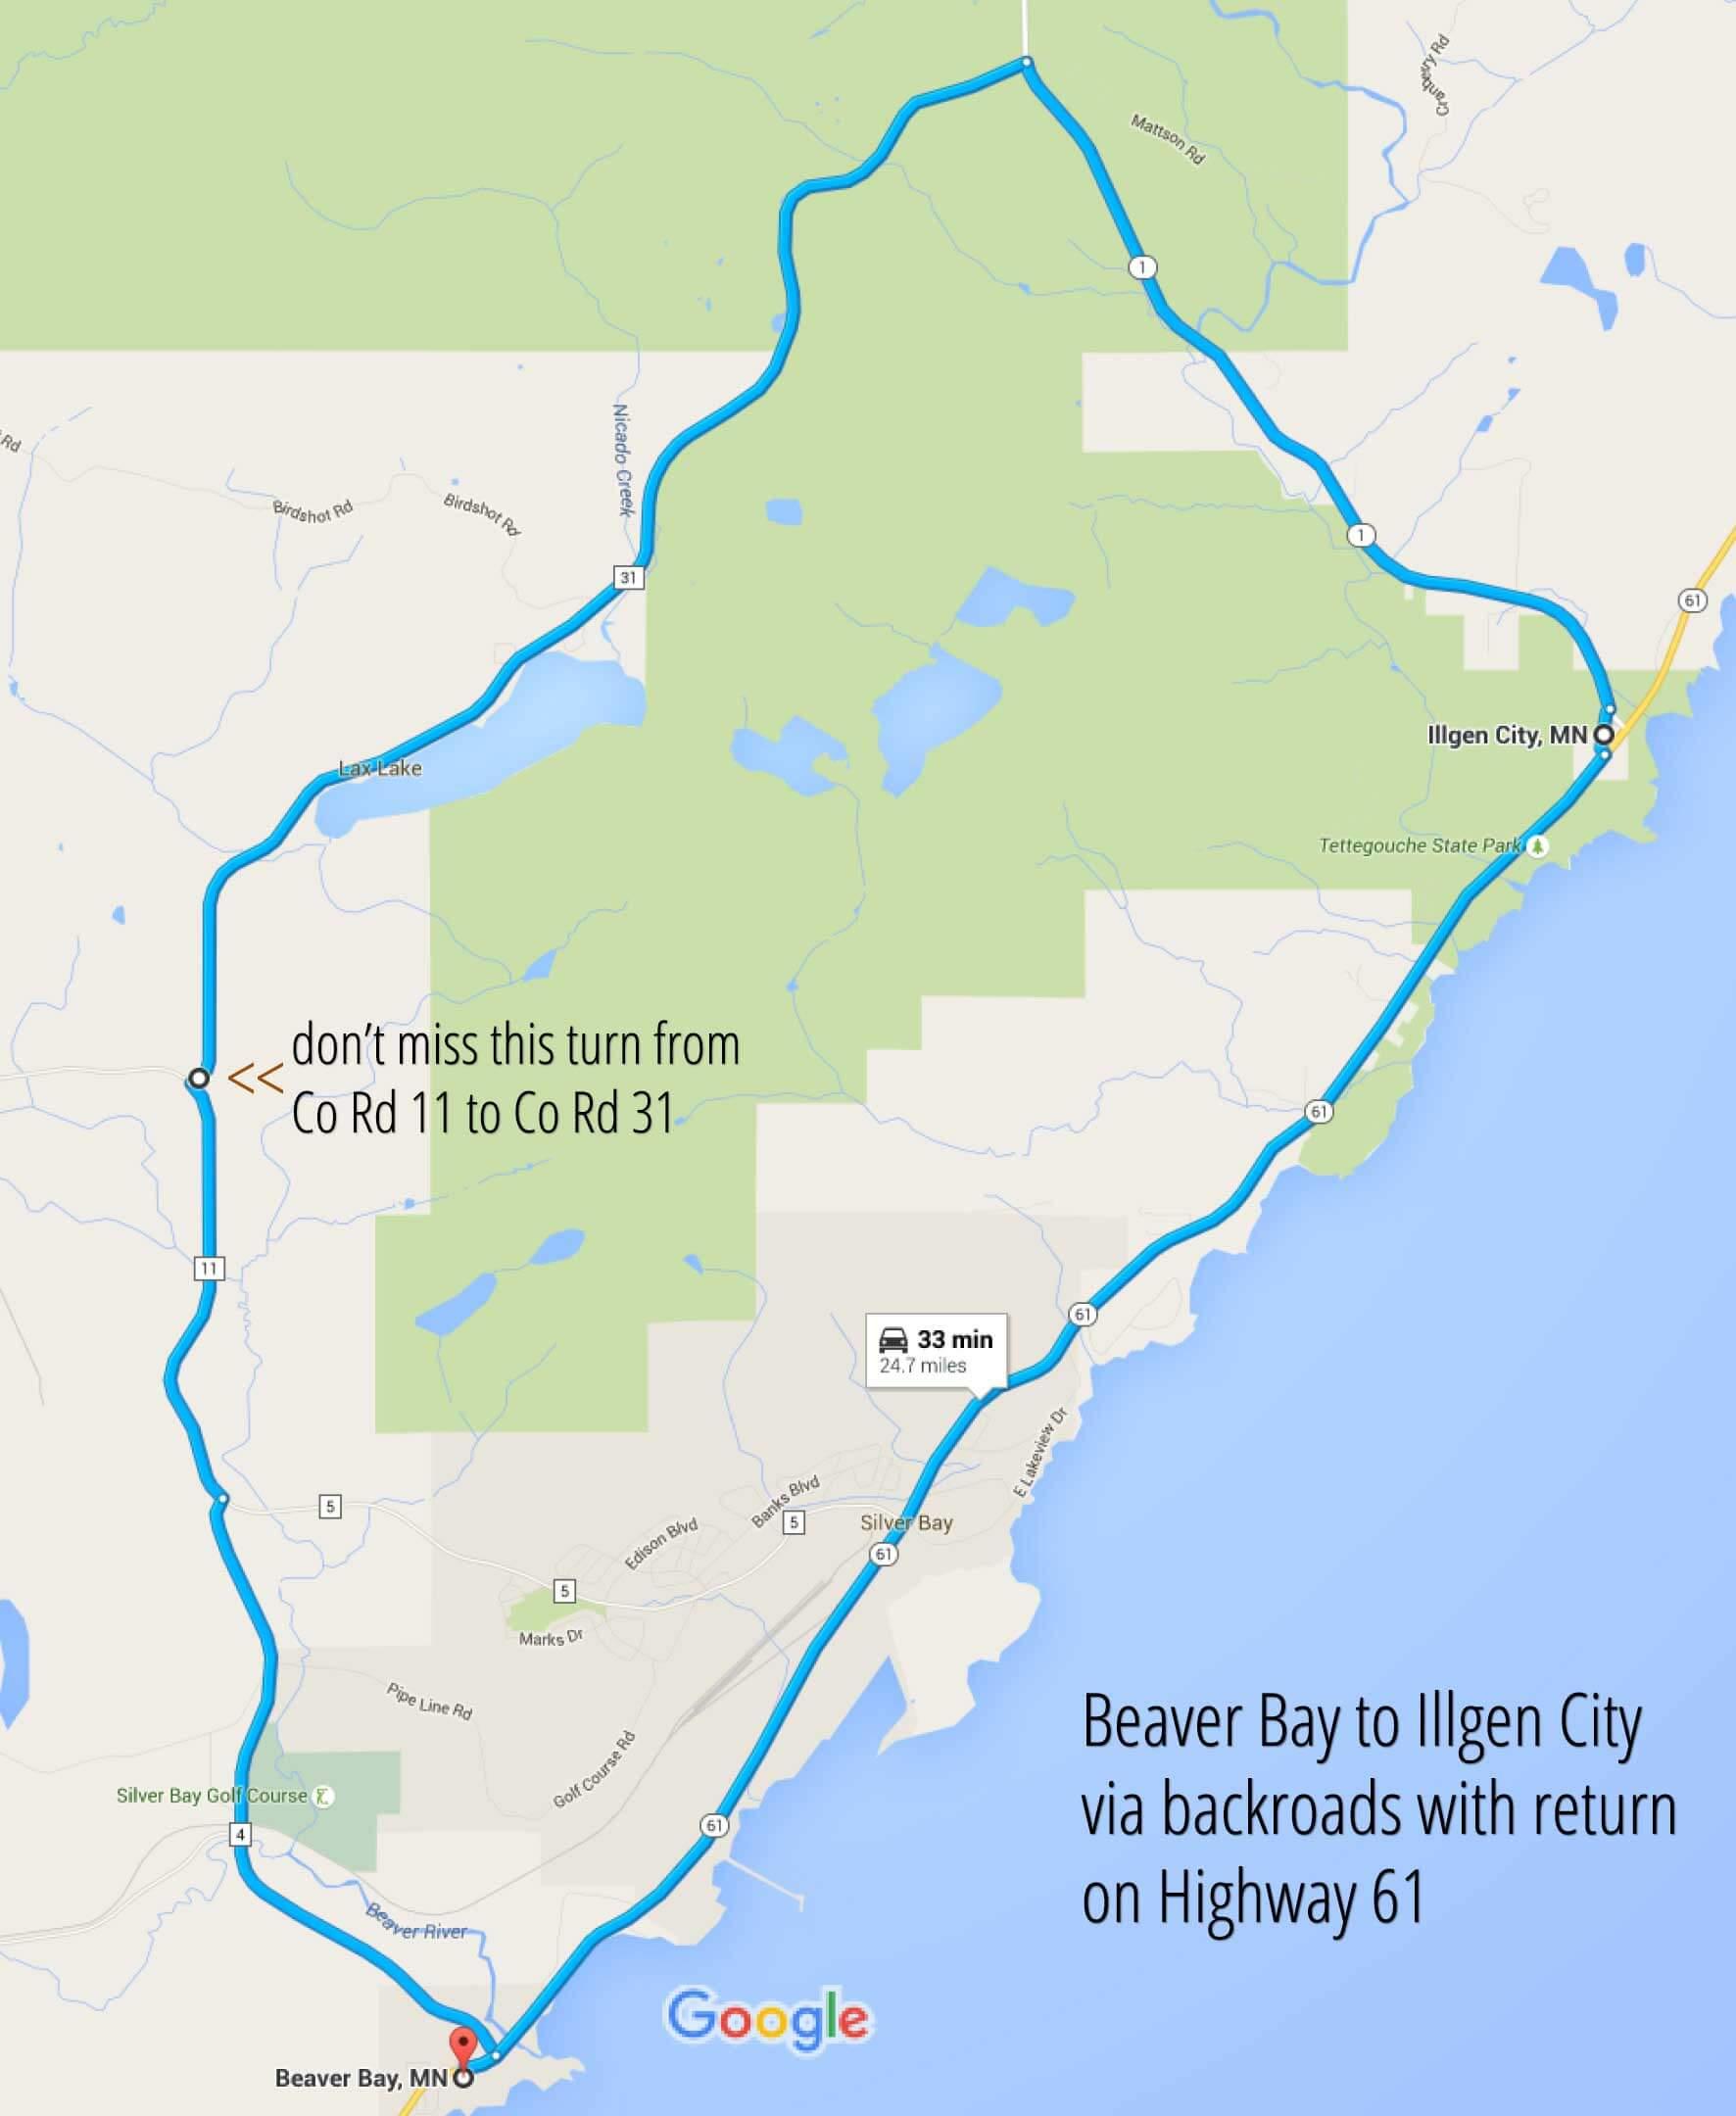 Beaver Bay to Illgen City